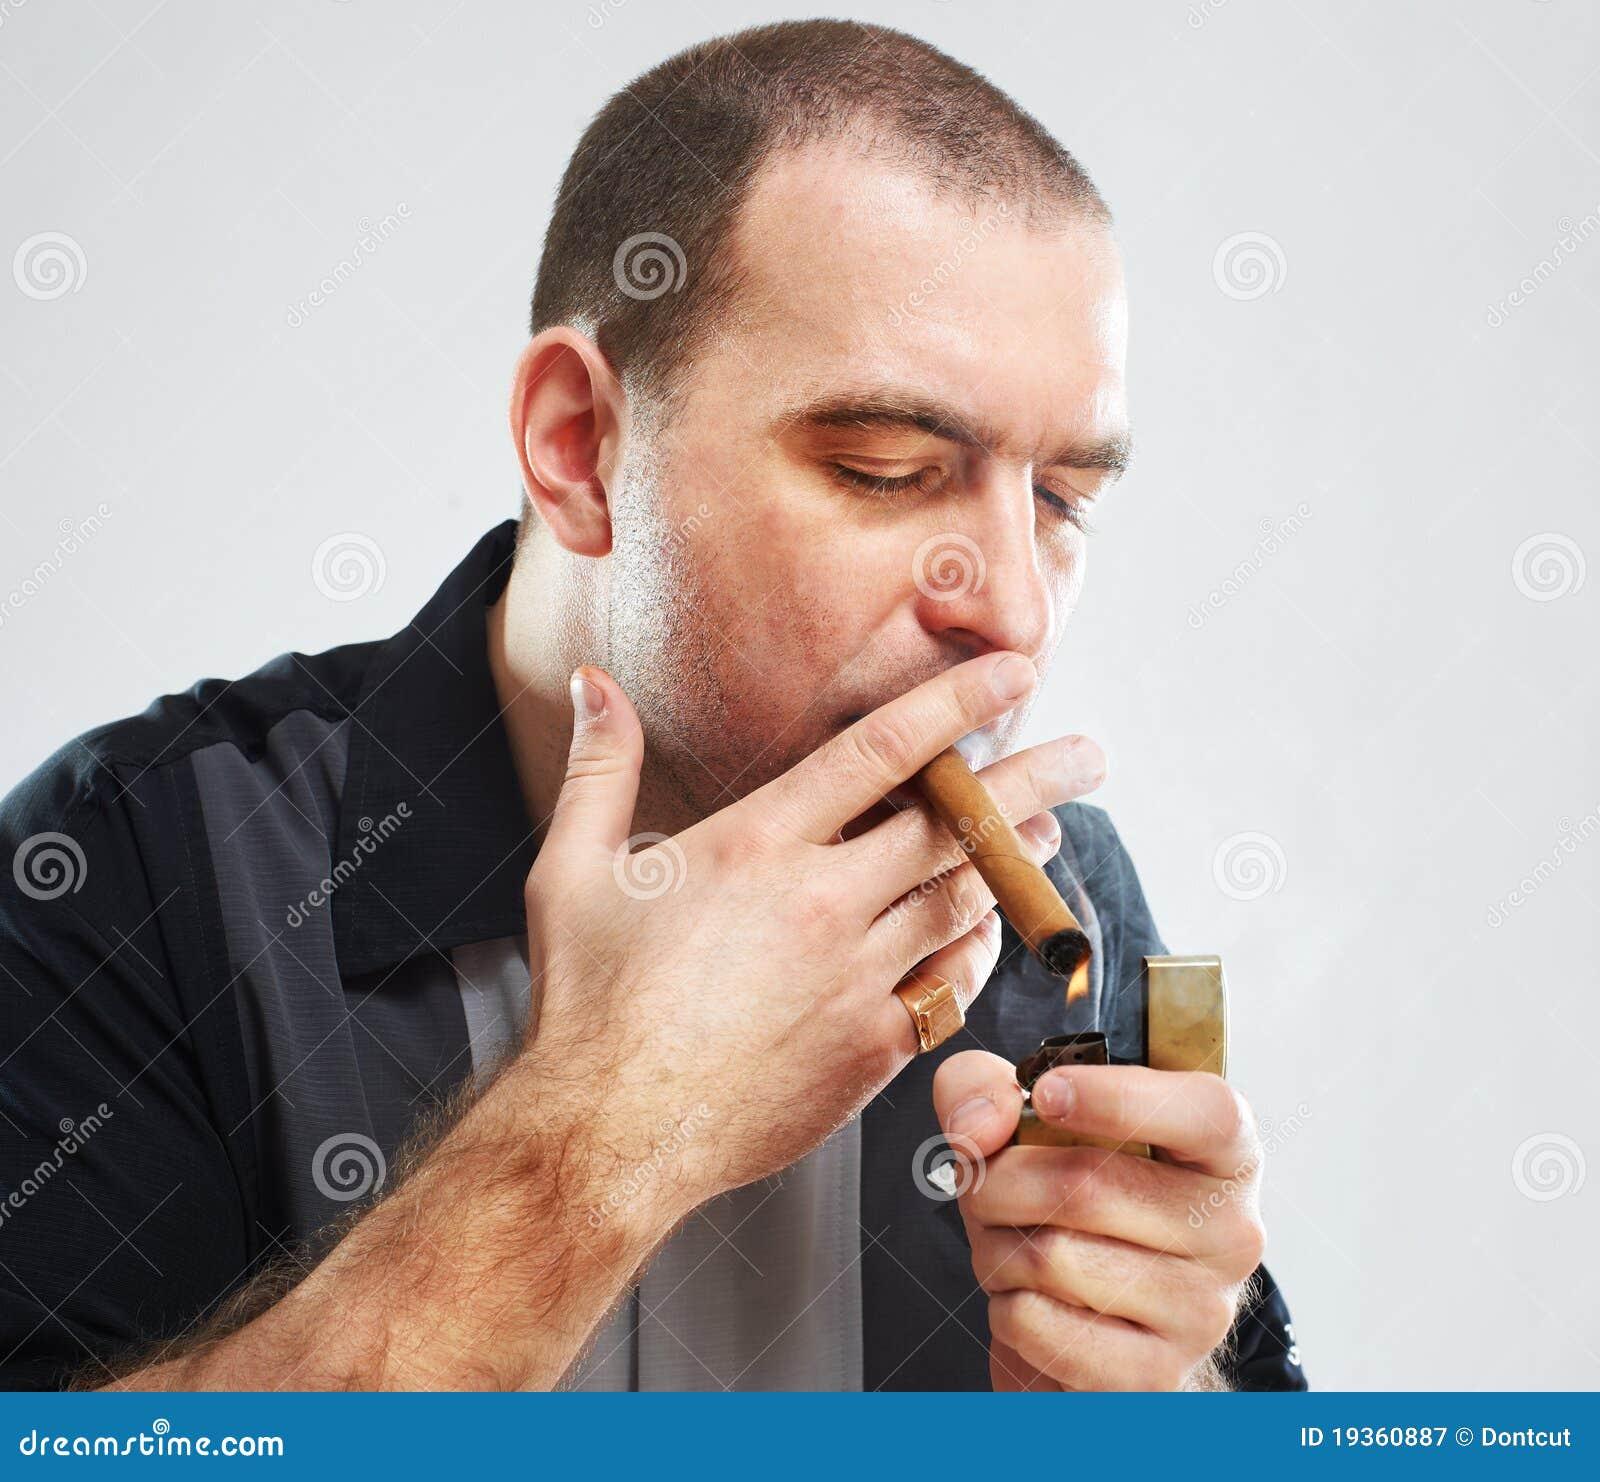 Retrato do tipo duro de fumo sério com charuto